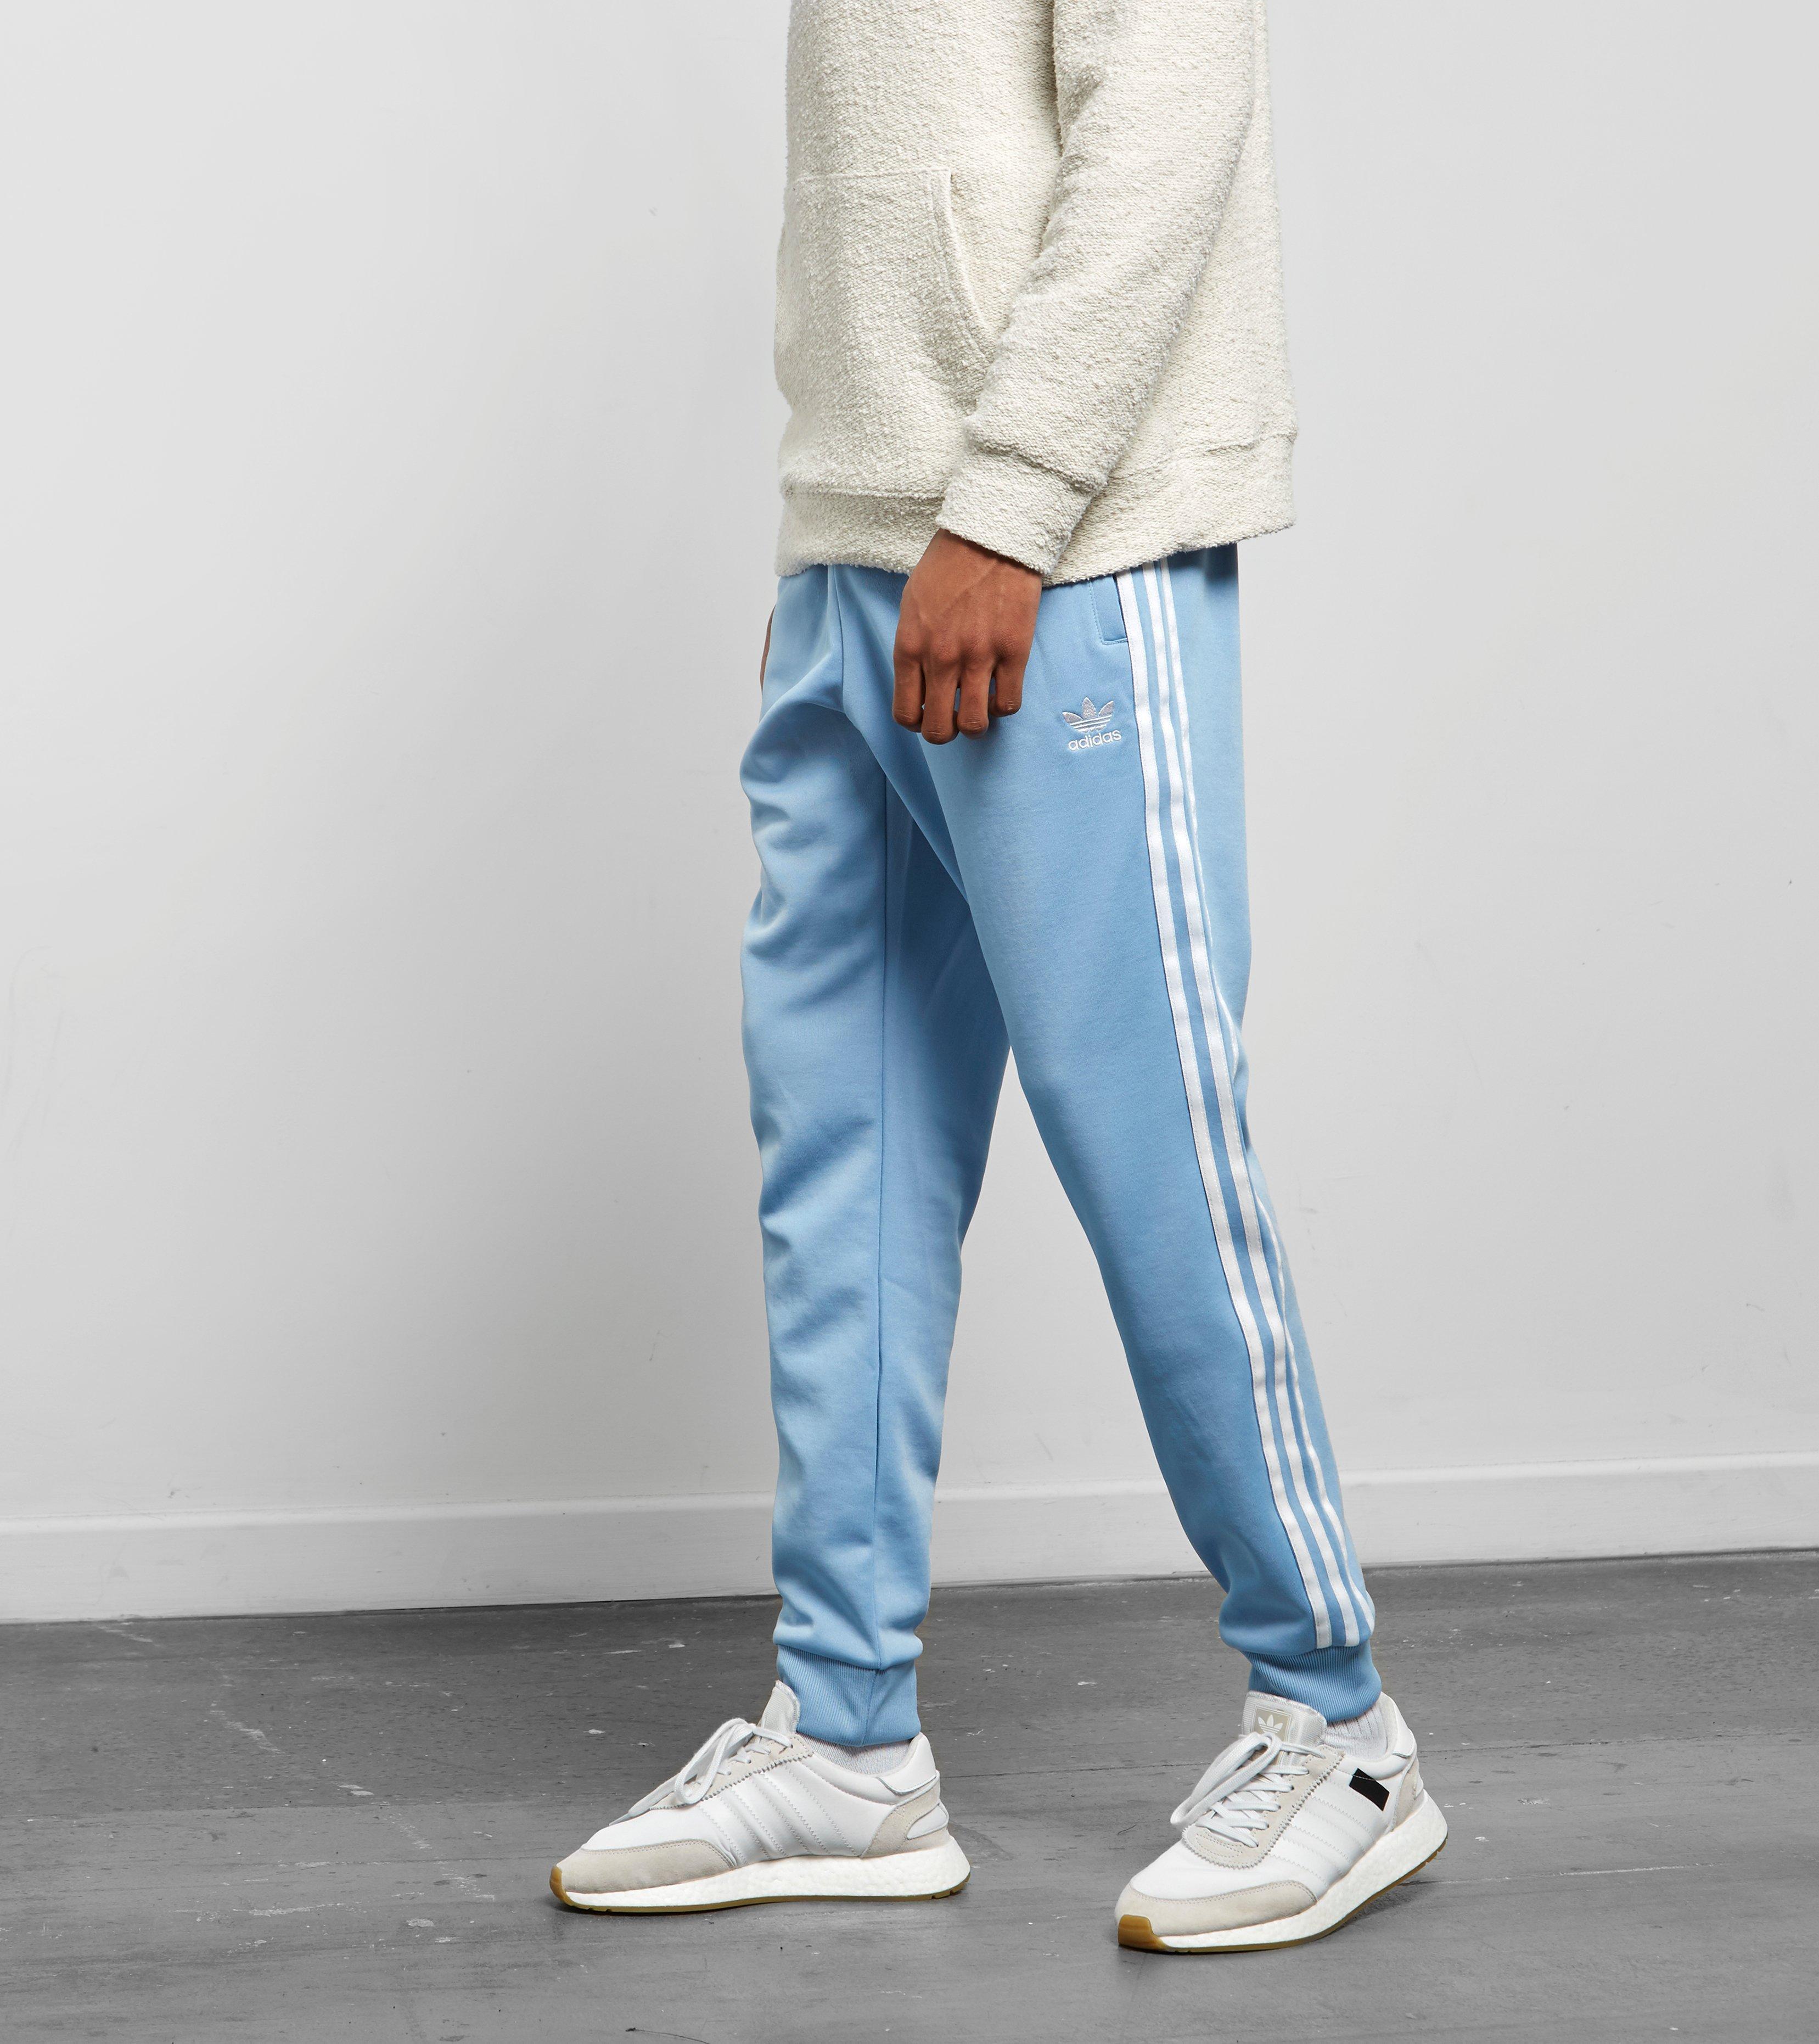 Adidas Originals Superstar track pants en color azul para hombres Lyst